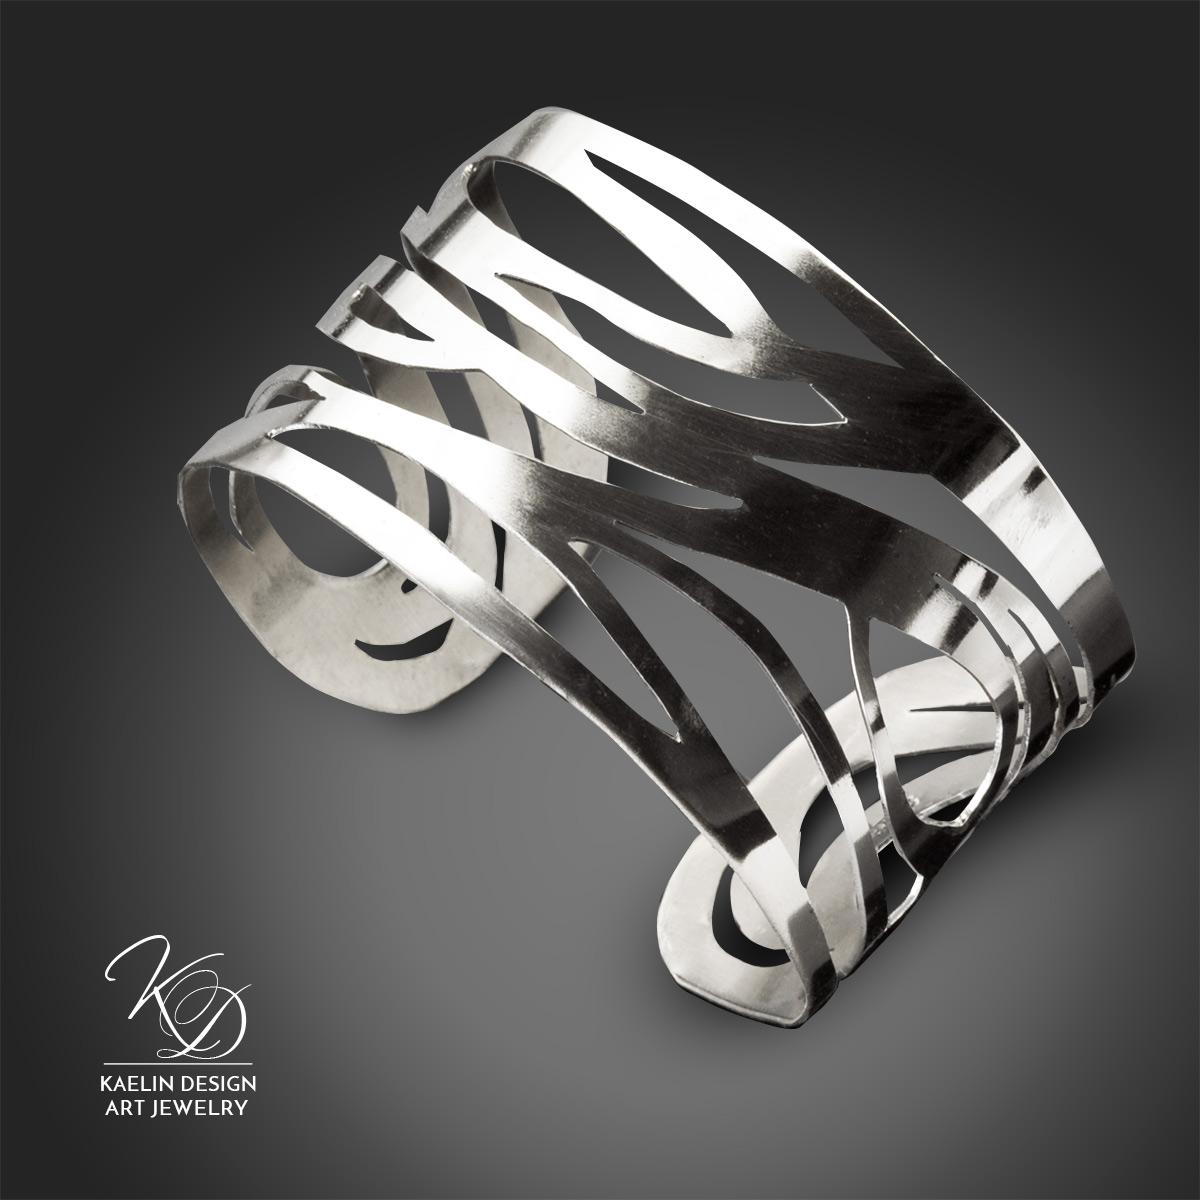 Undercurrents forged Argentium Silver cuff bracelet by Kaelin Design Fine Art Jewelry